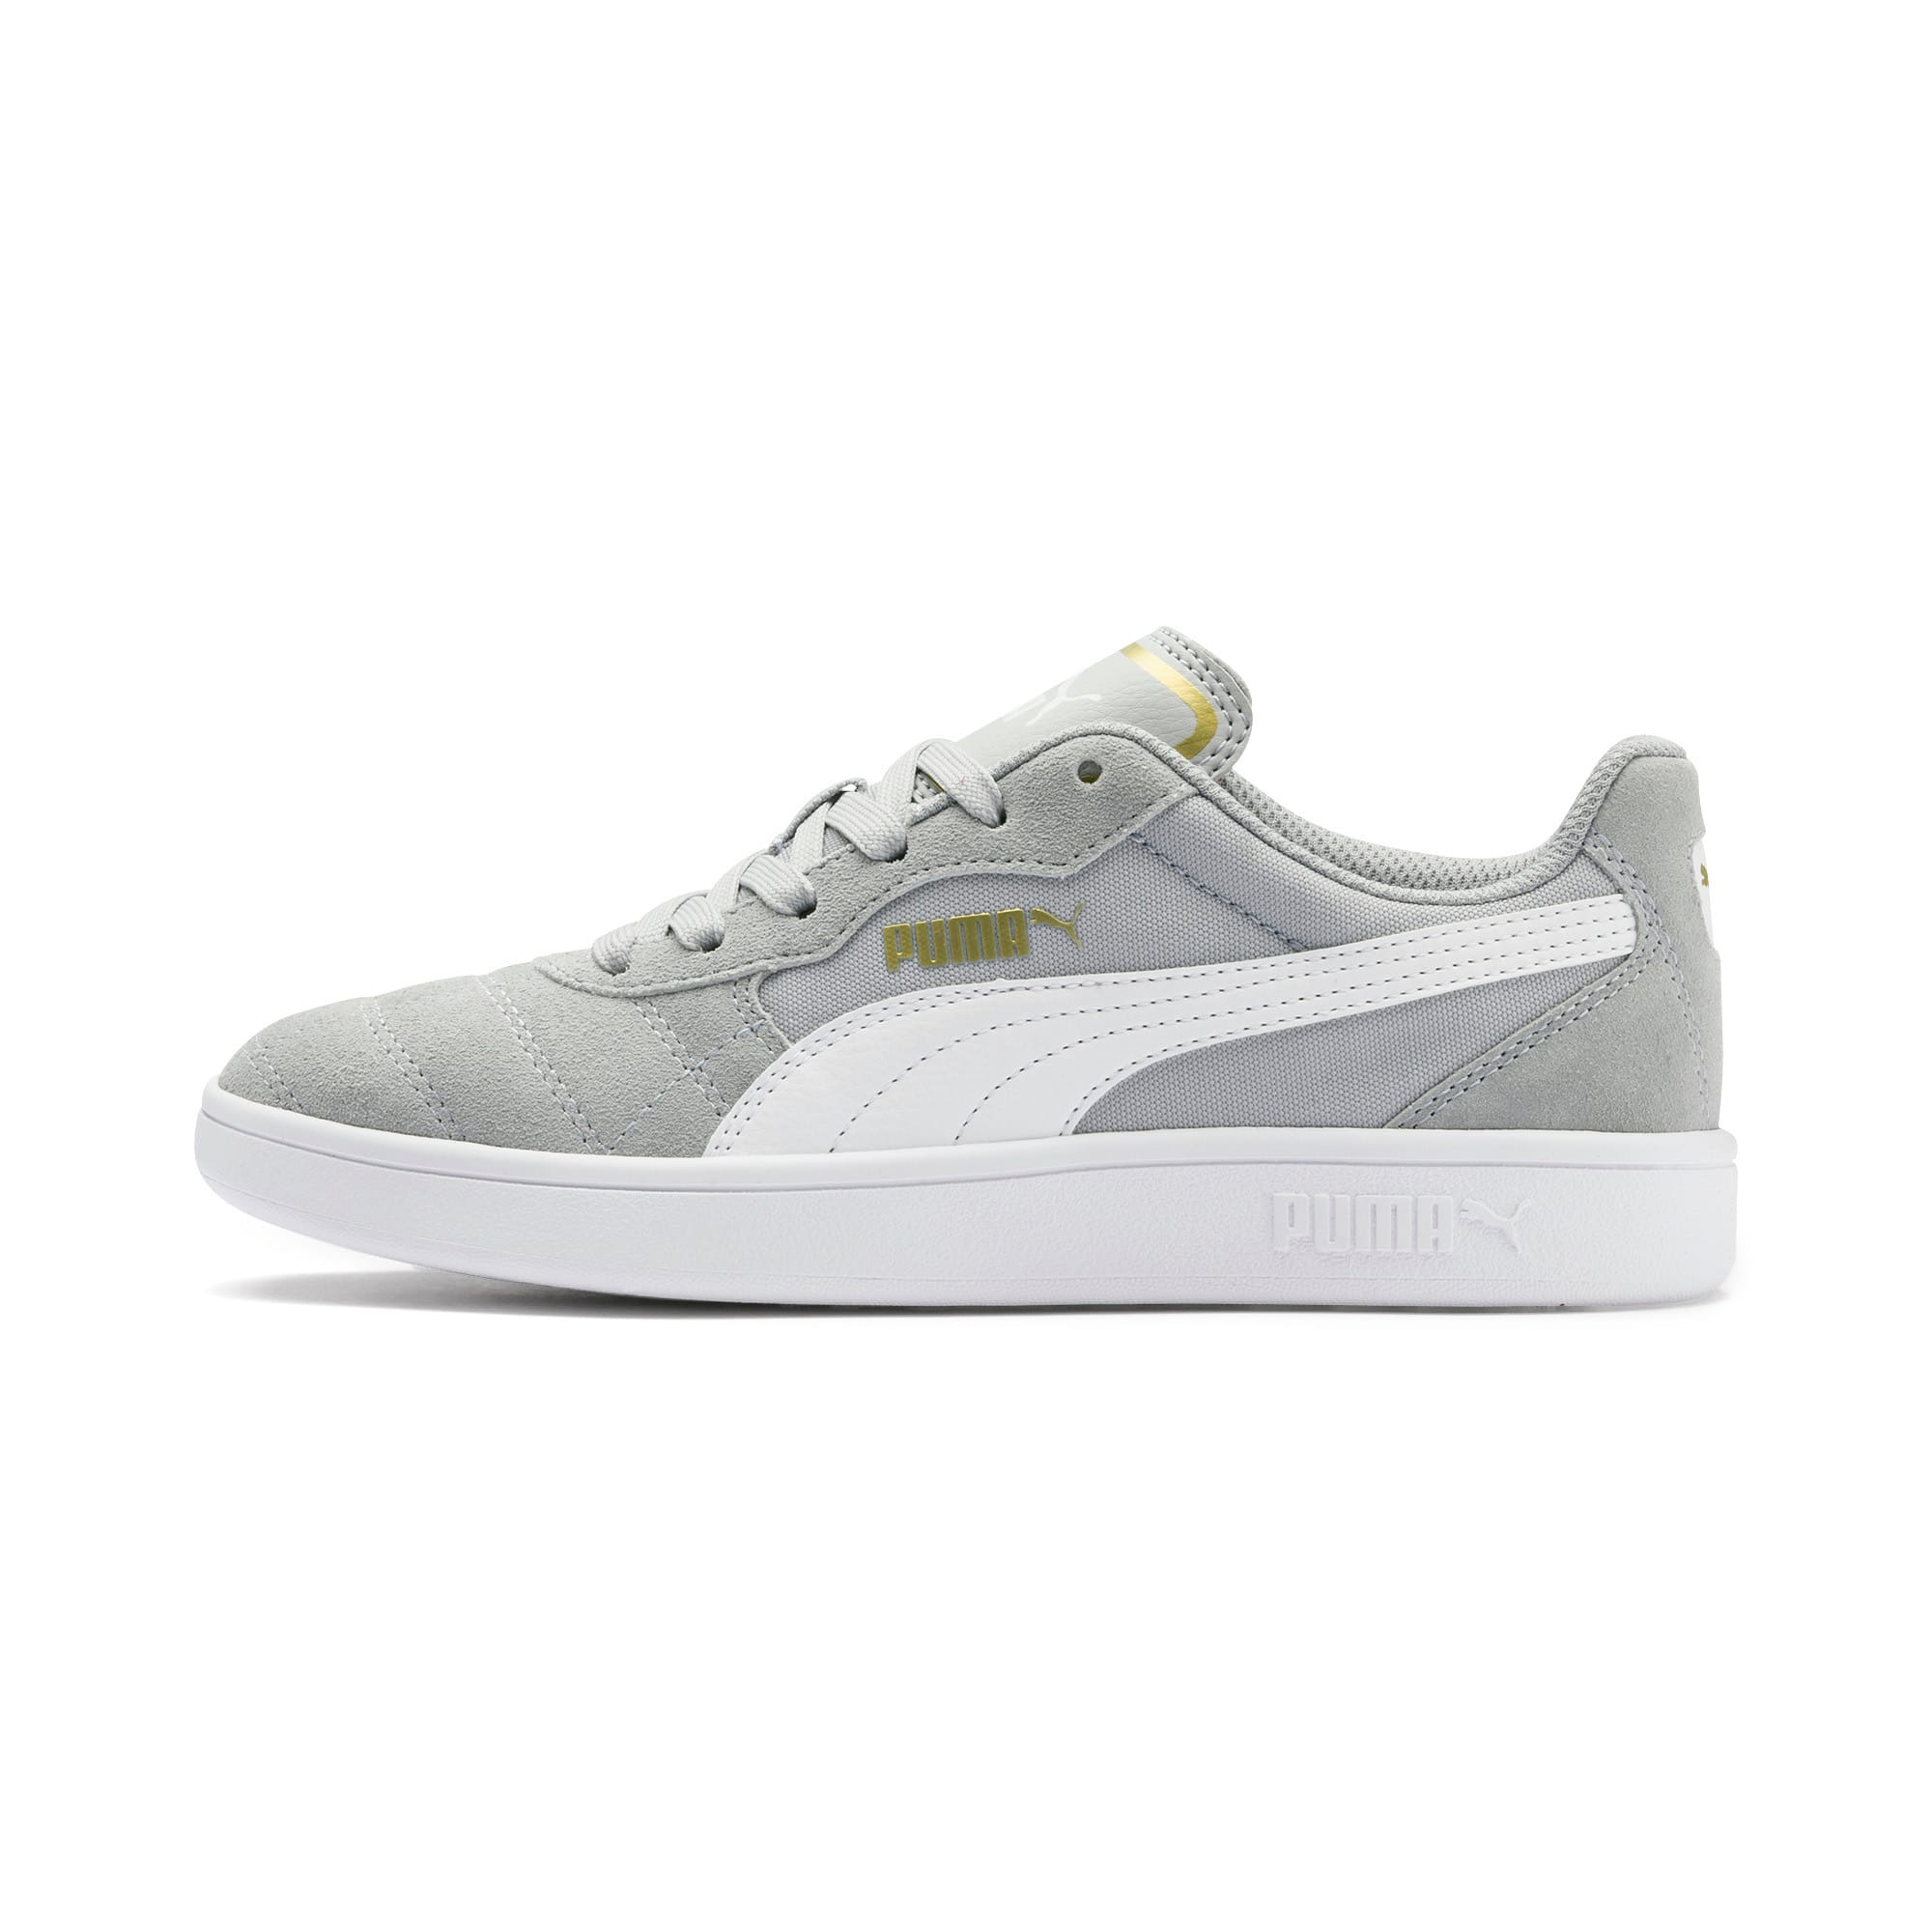 Thumbnail 1 of Astro Kick Sneakers JR, HRise-White-Gold-GViolet-Gum, medium